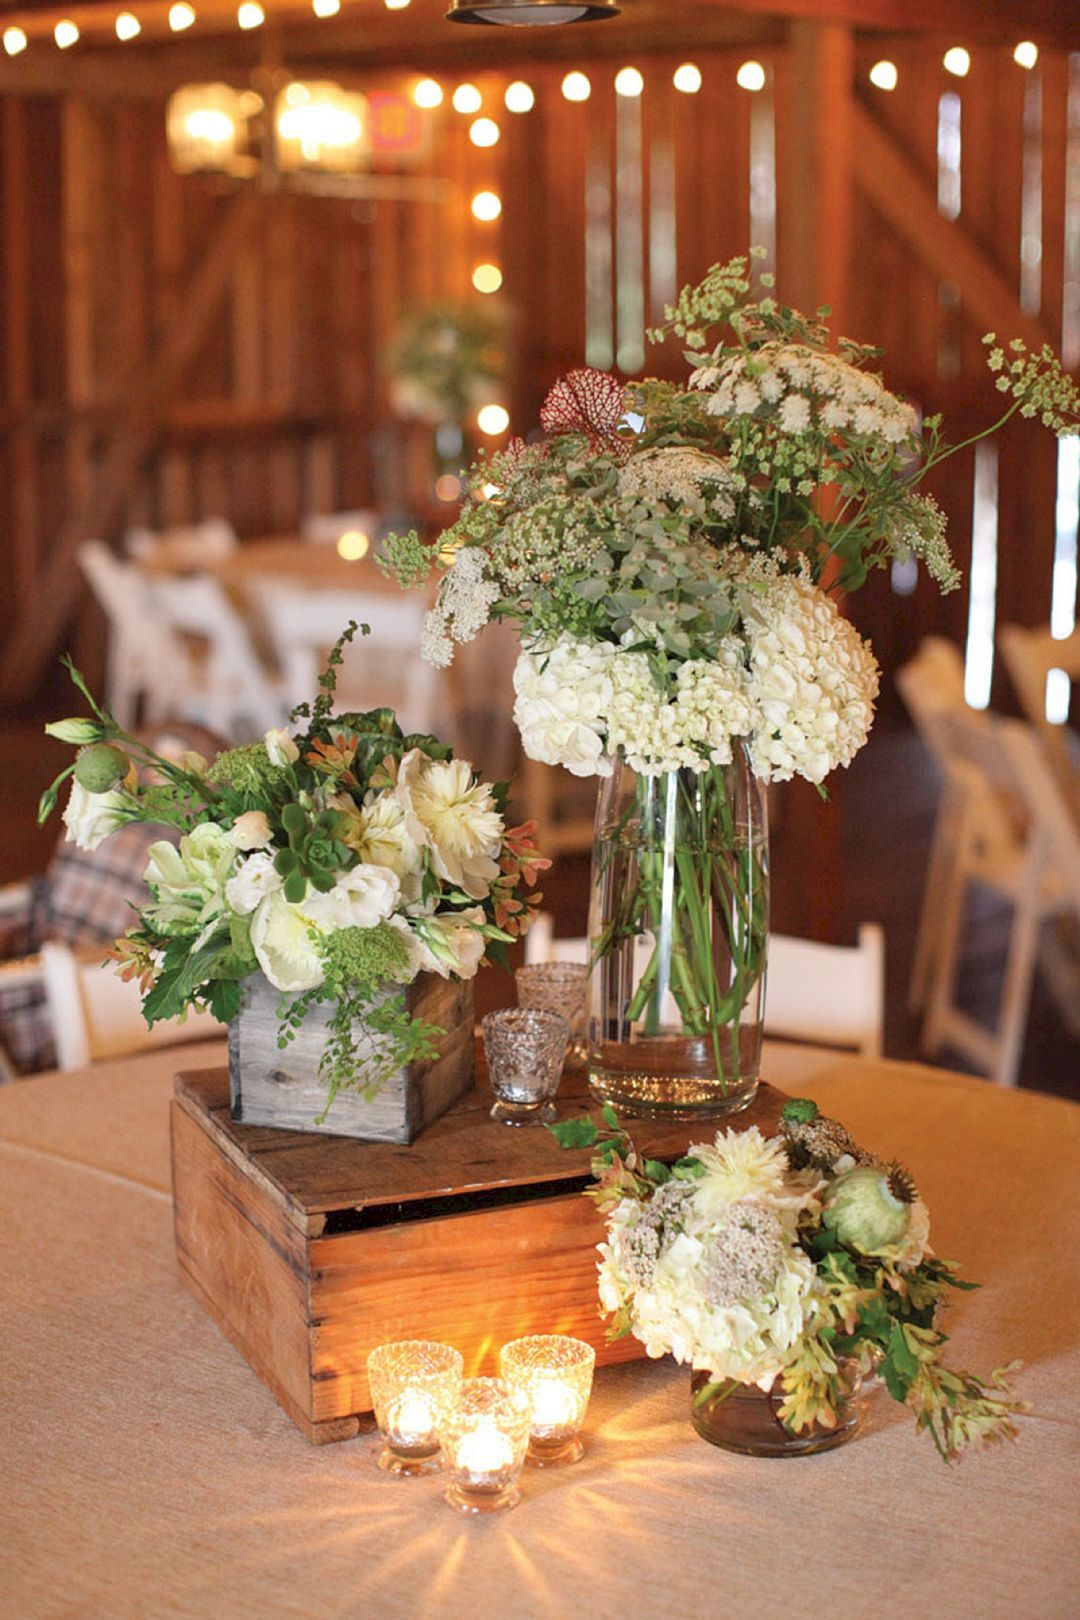 Wedding decoration ideas rustic   DIY Creative Rustic Chic Wedding Centerpieces Ideas  Цветы и